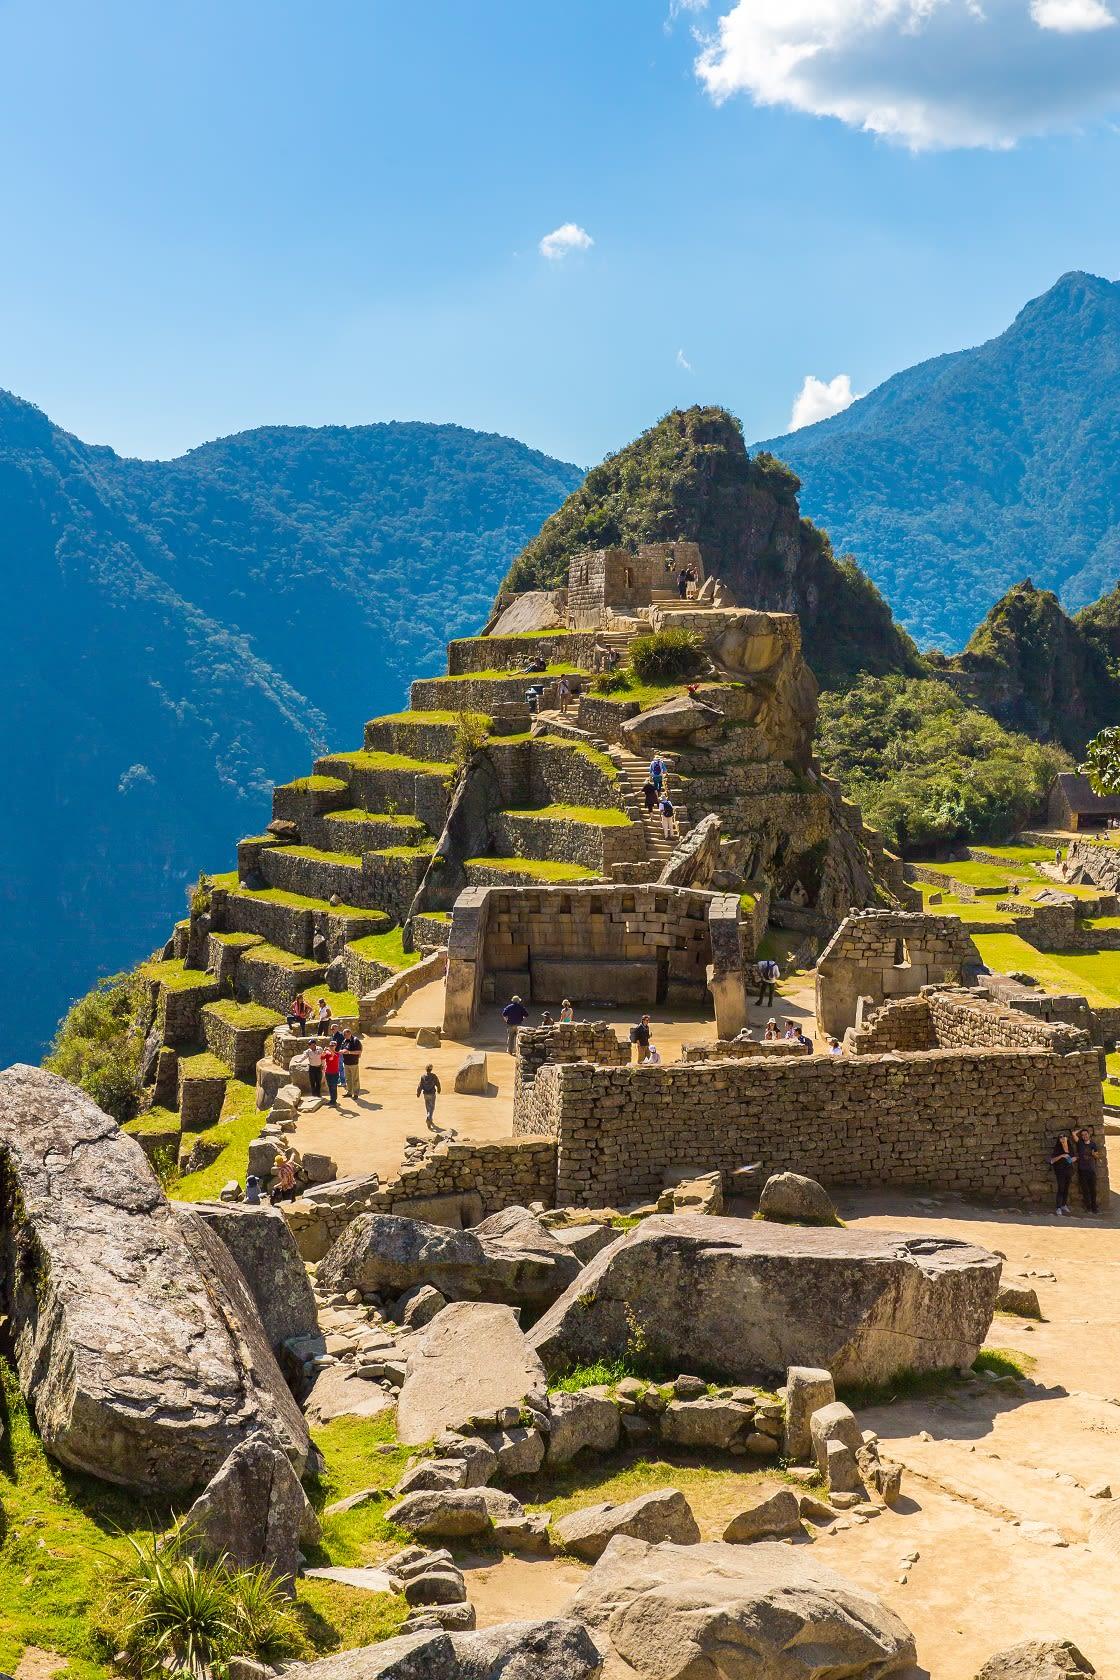 Tourists Visiting The Sacred Plaza at Machu Picchu, Peru